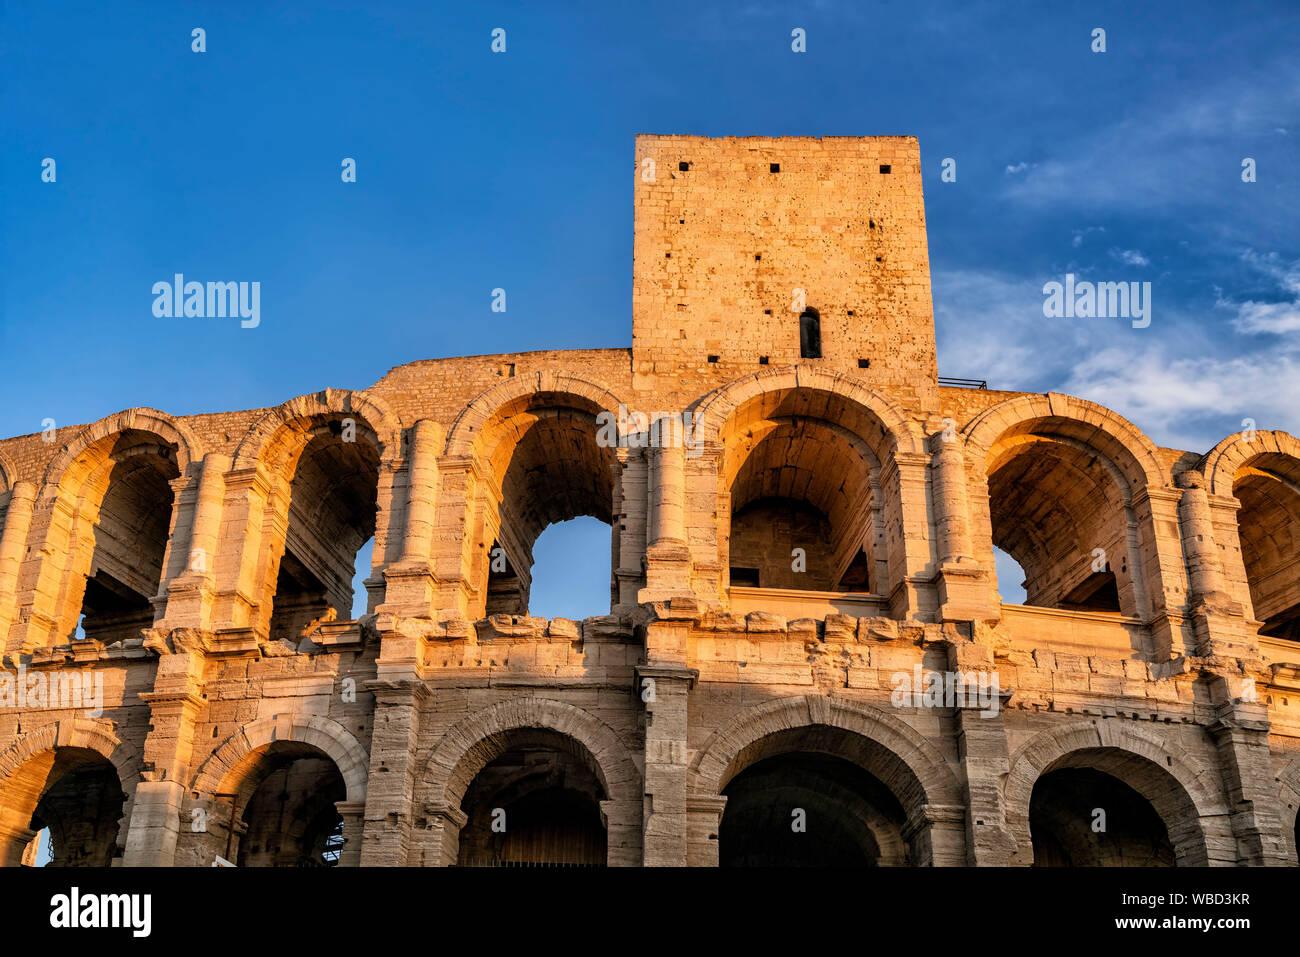 Roman Amphitheatre, Arena, Arles, Bouche du Rhone, Provence, France Stock Photo